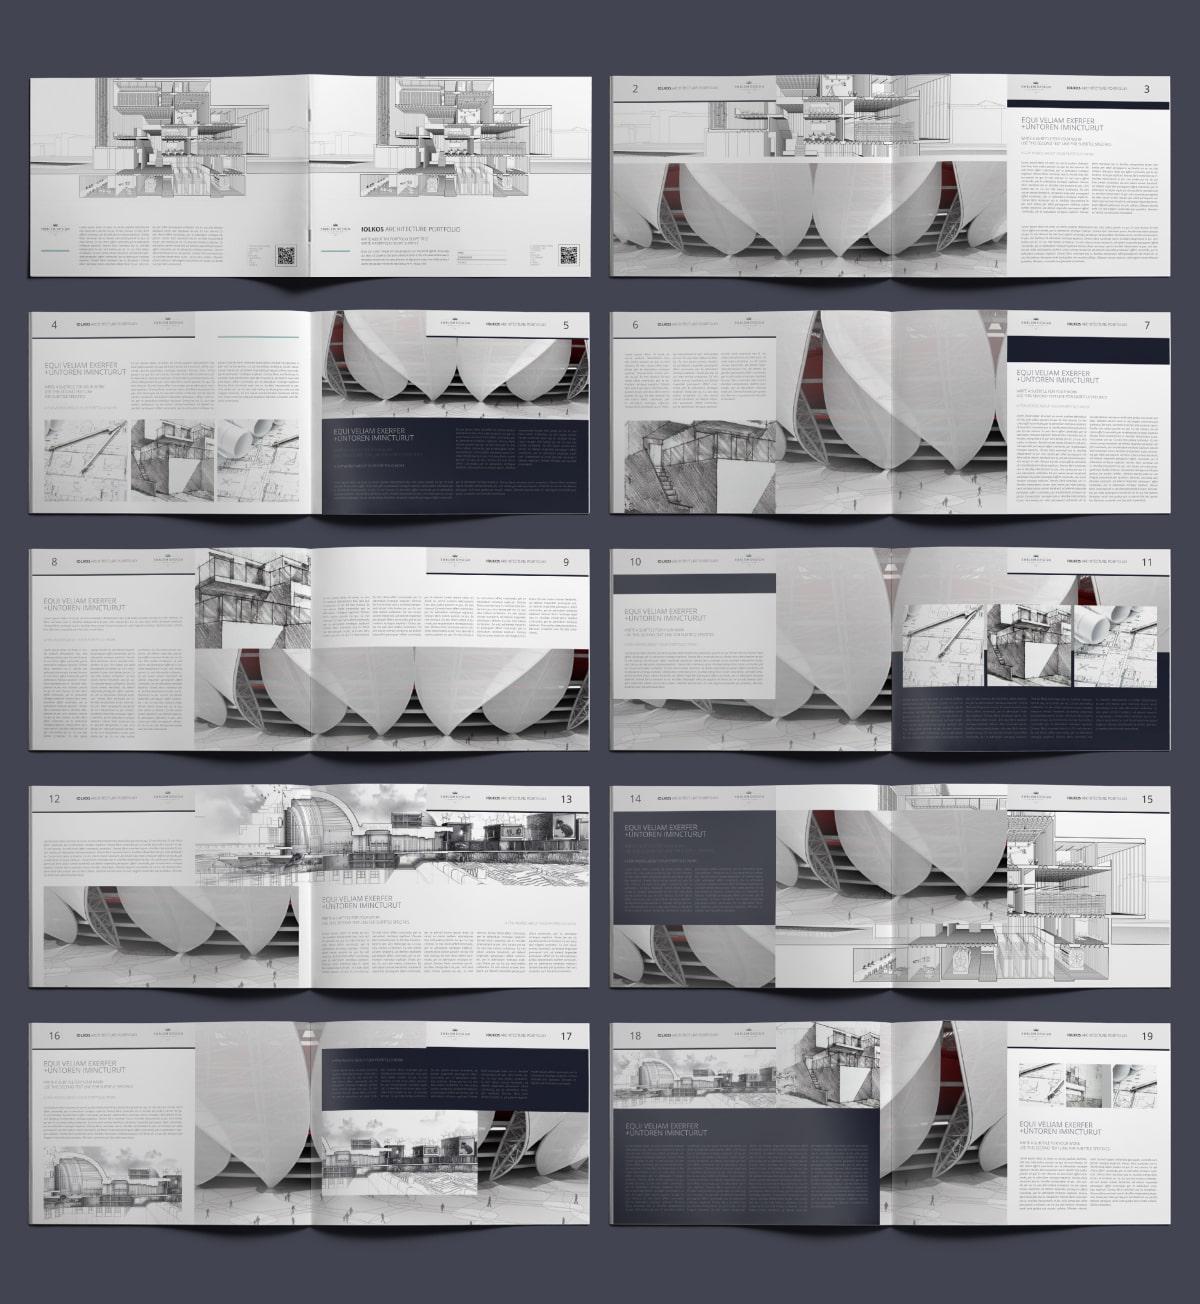 Iolkos Architecture Portfolio A4 Landscape - Layouts